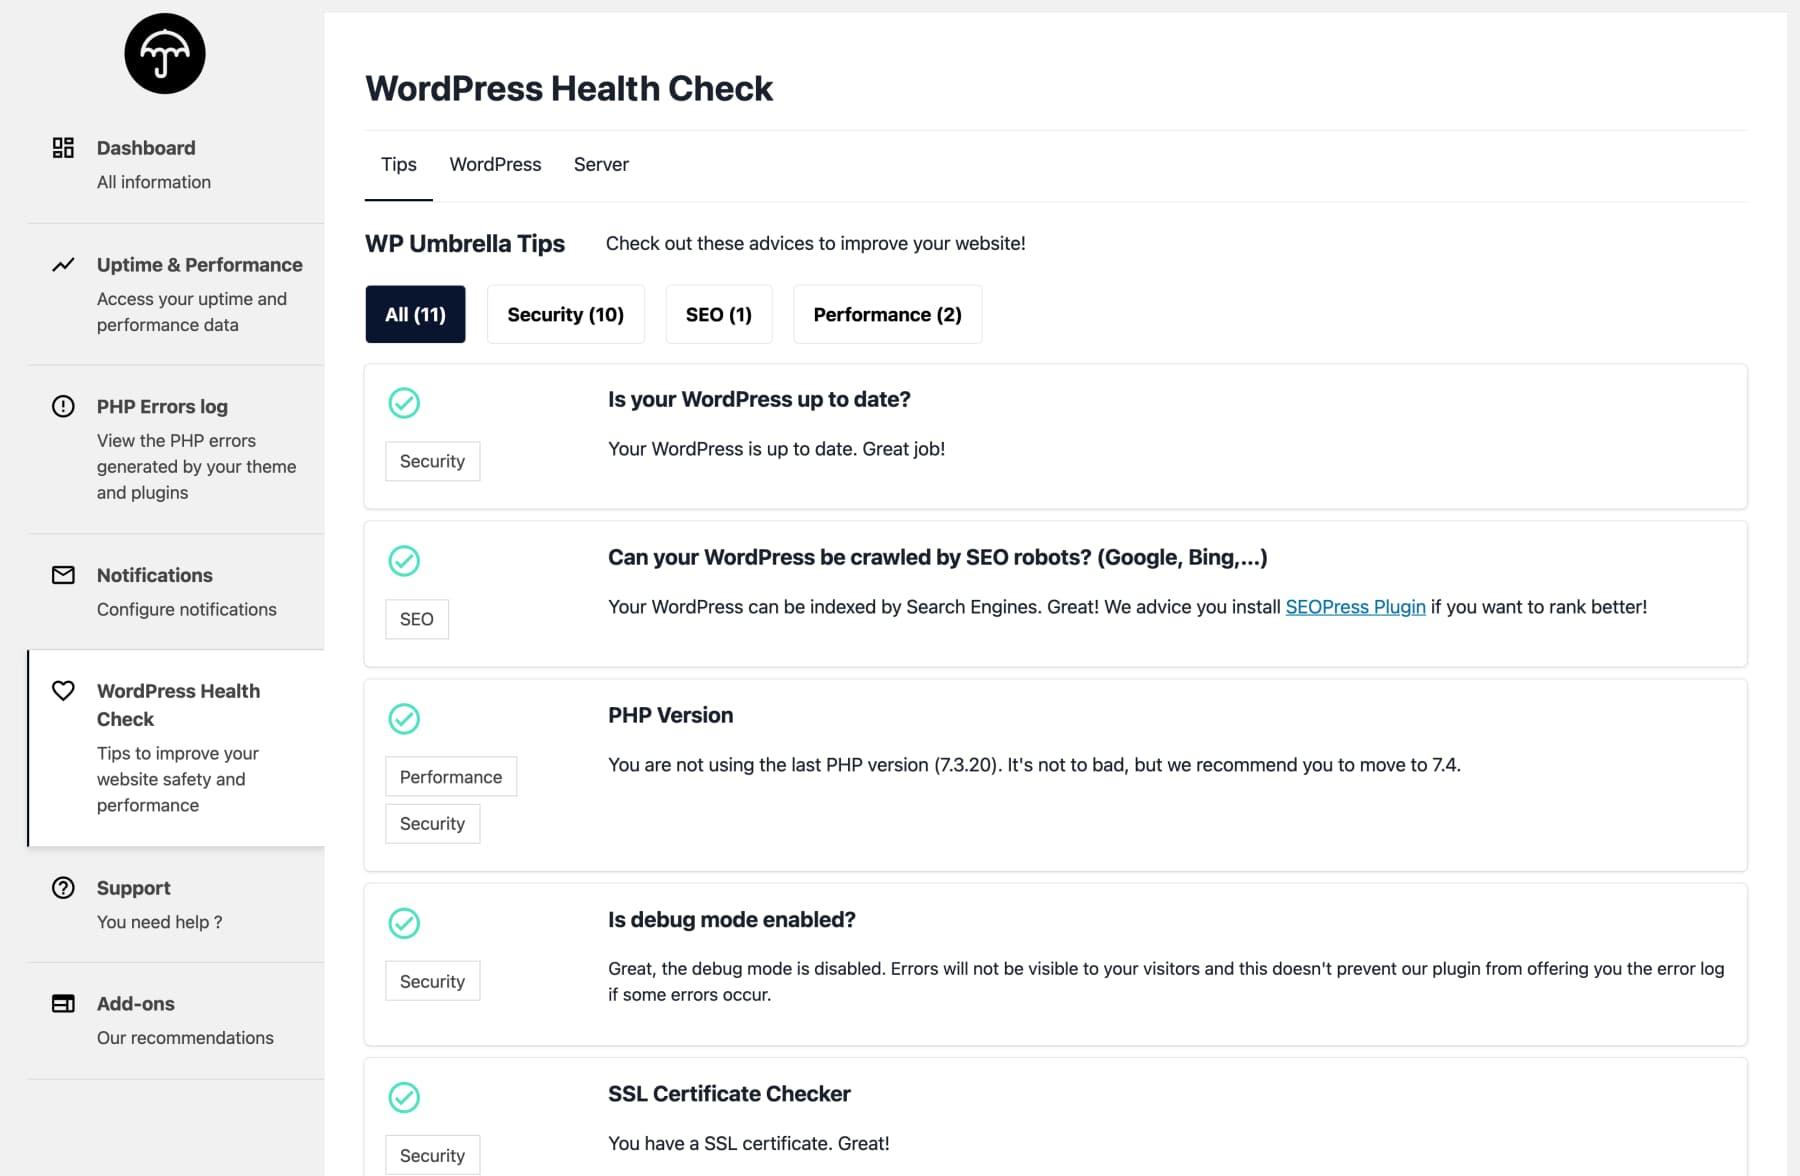 WordPress health check WP Umbrella